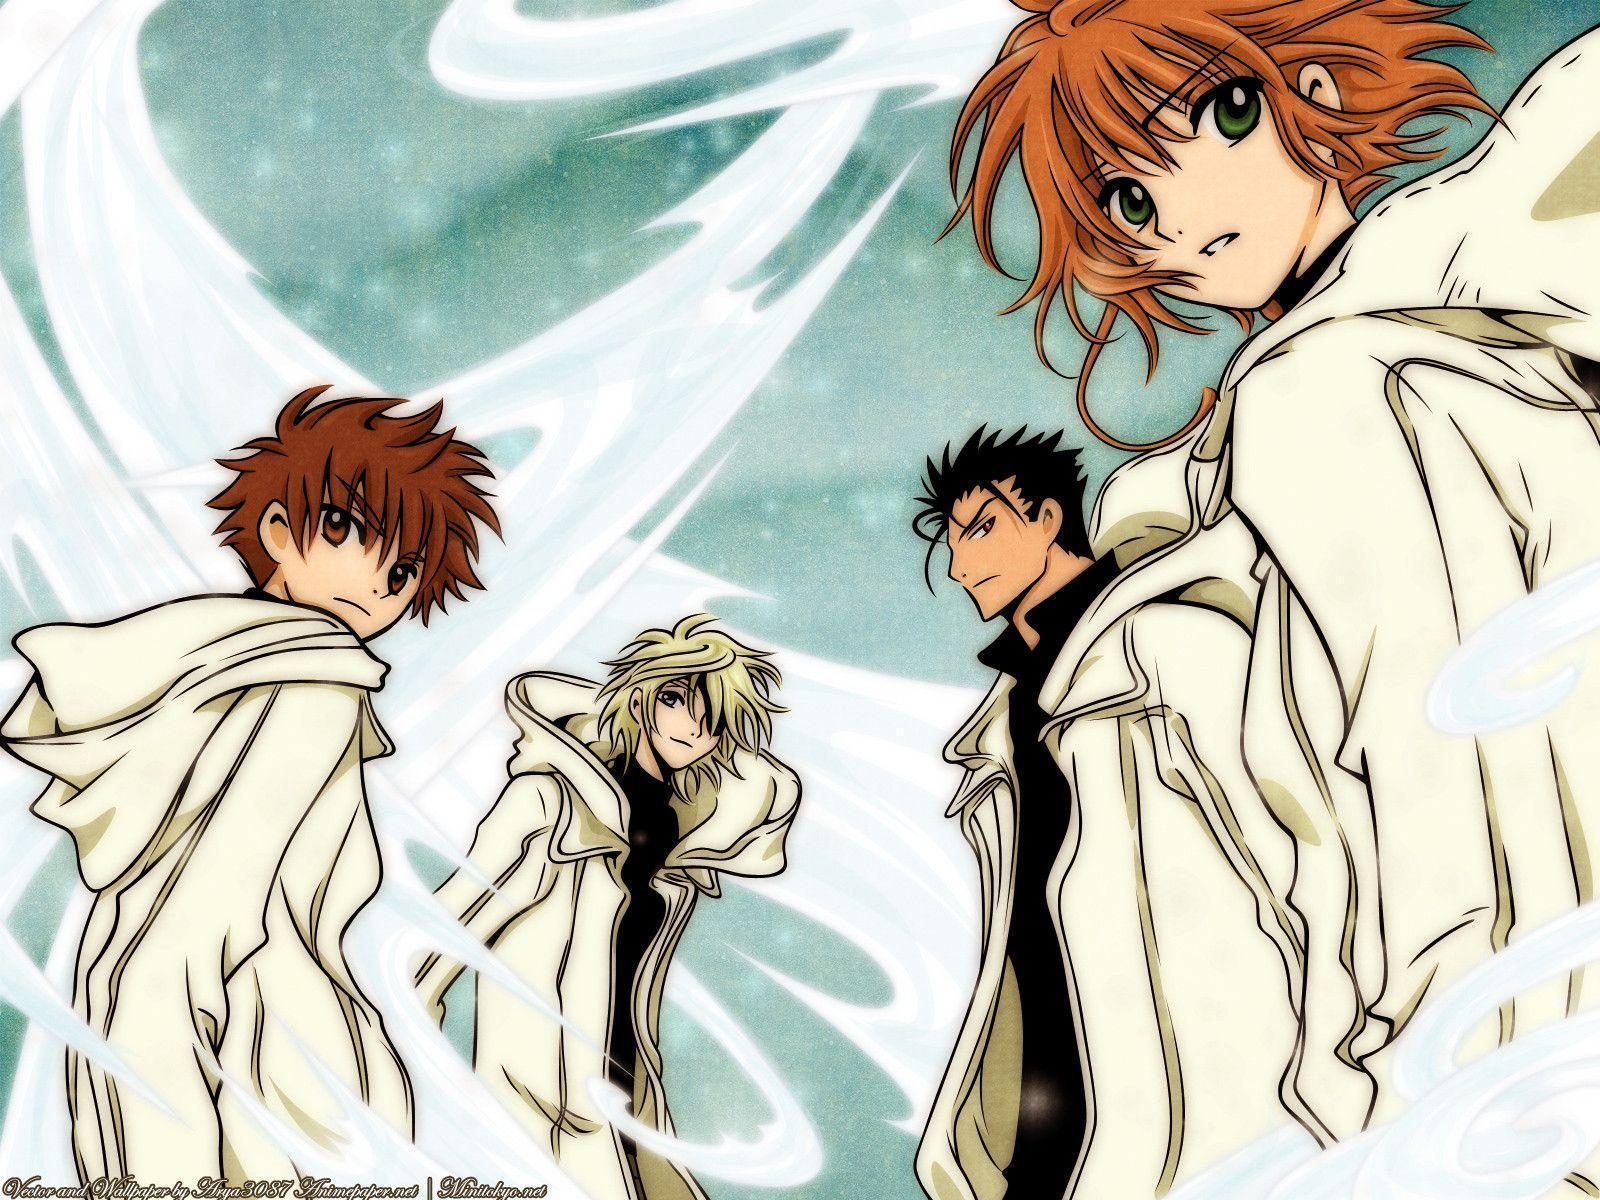 Tsubasa: Reservoir Chronicle wallpapers, Anime, HQ Tsubasa: Reservoir Chronicle pictures   4K